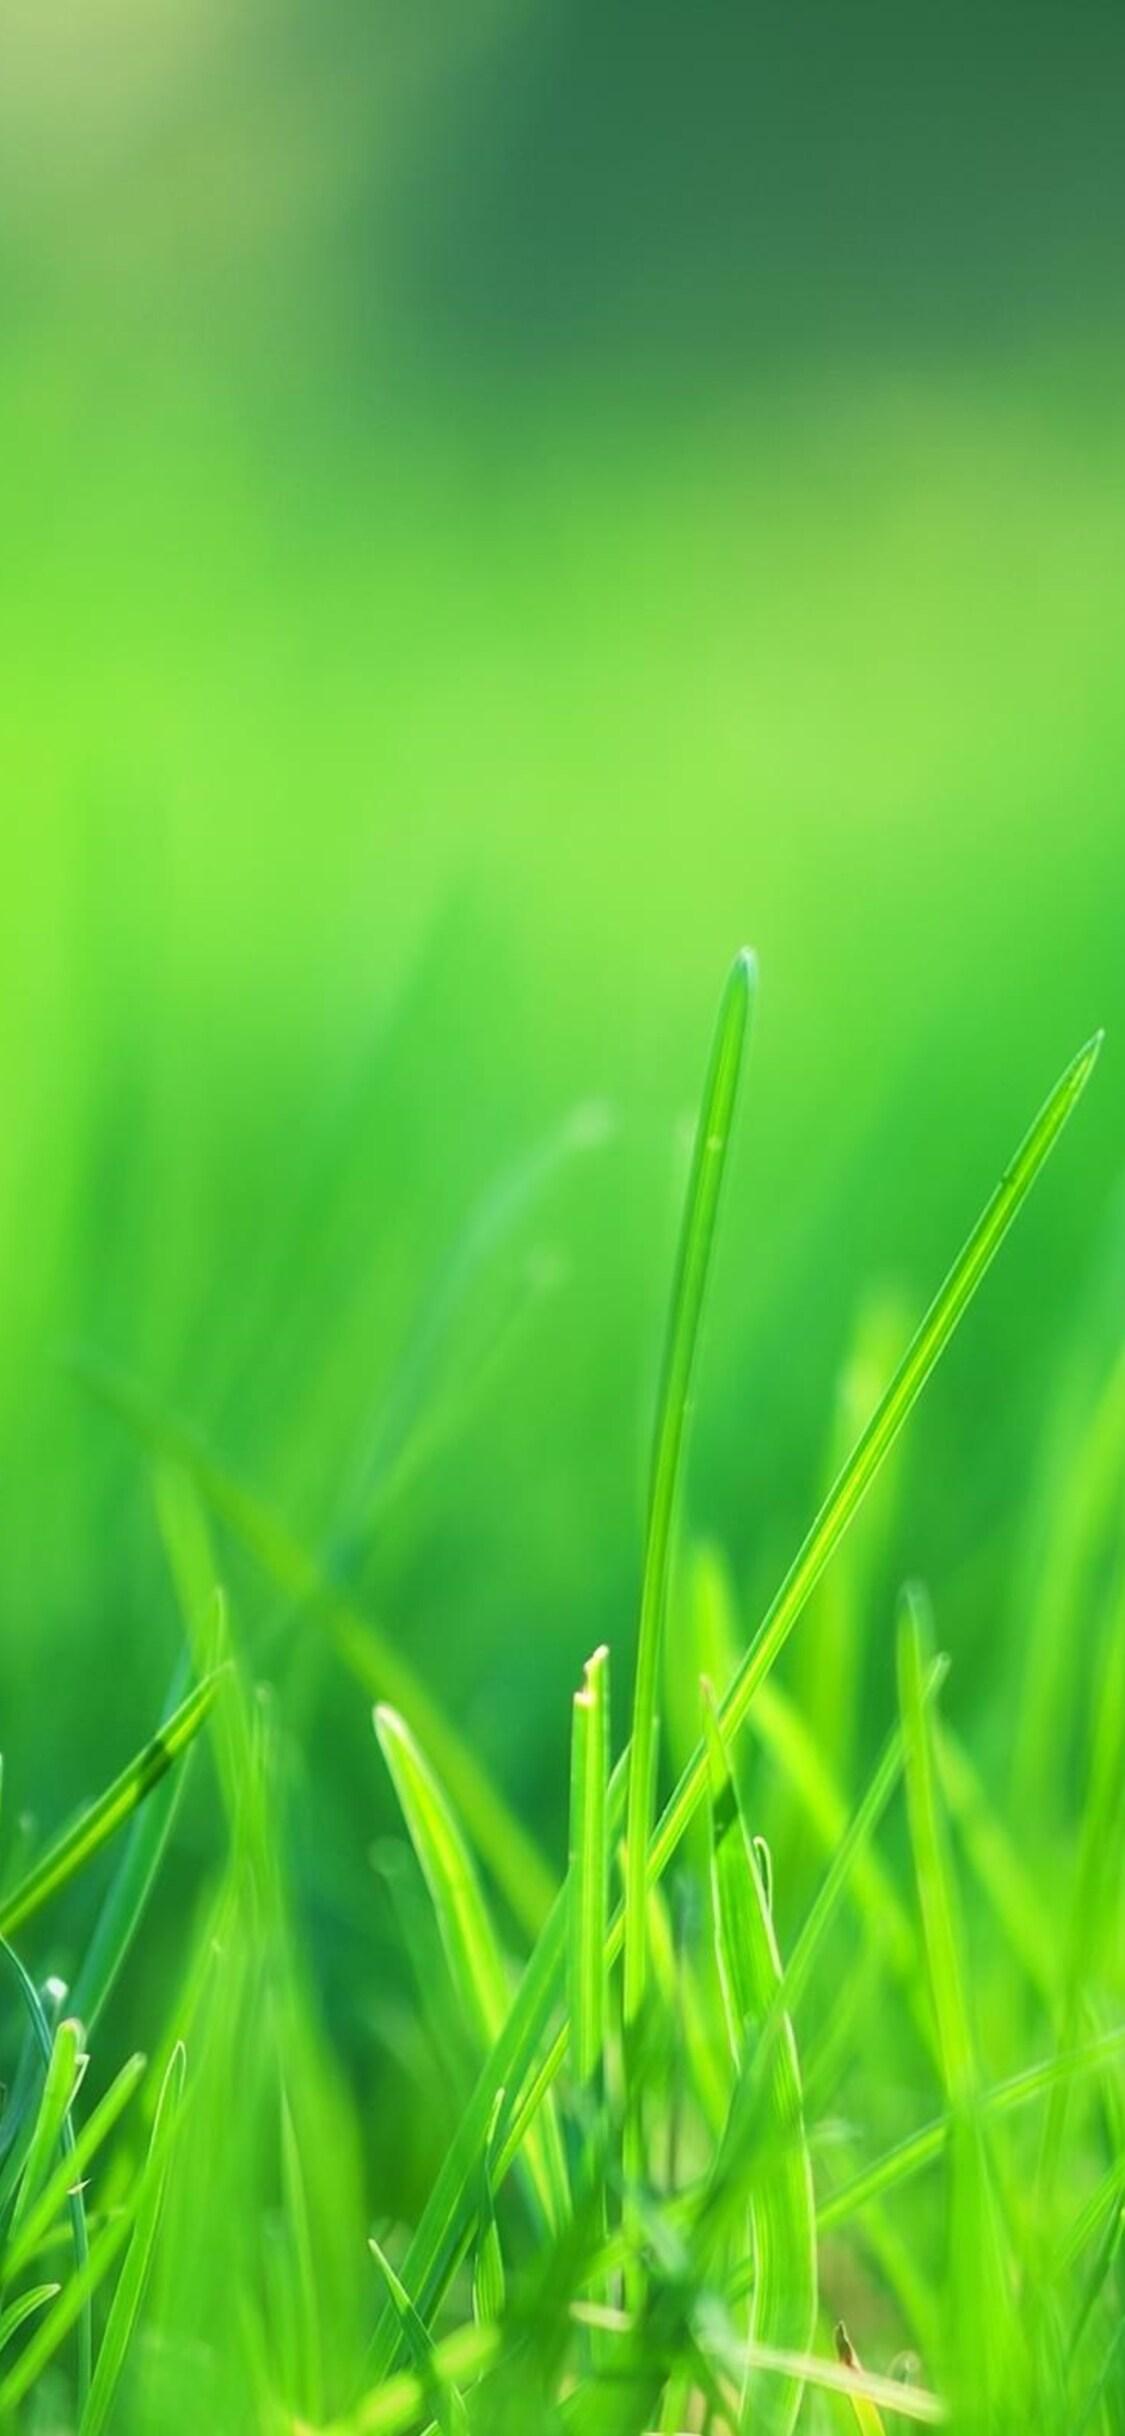 1125x2436 Green Grass Field Iphone Xs Iphone 10 Iphone X Hd 4k